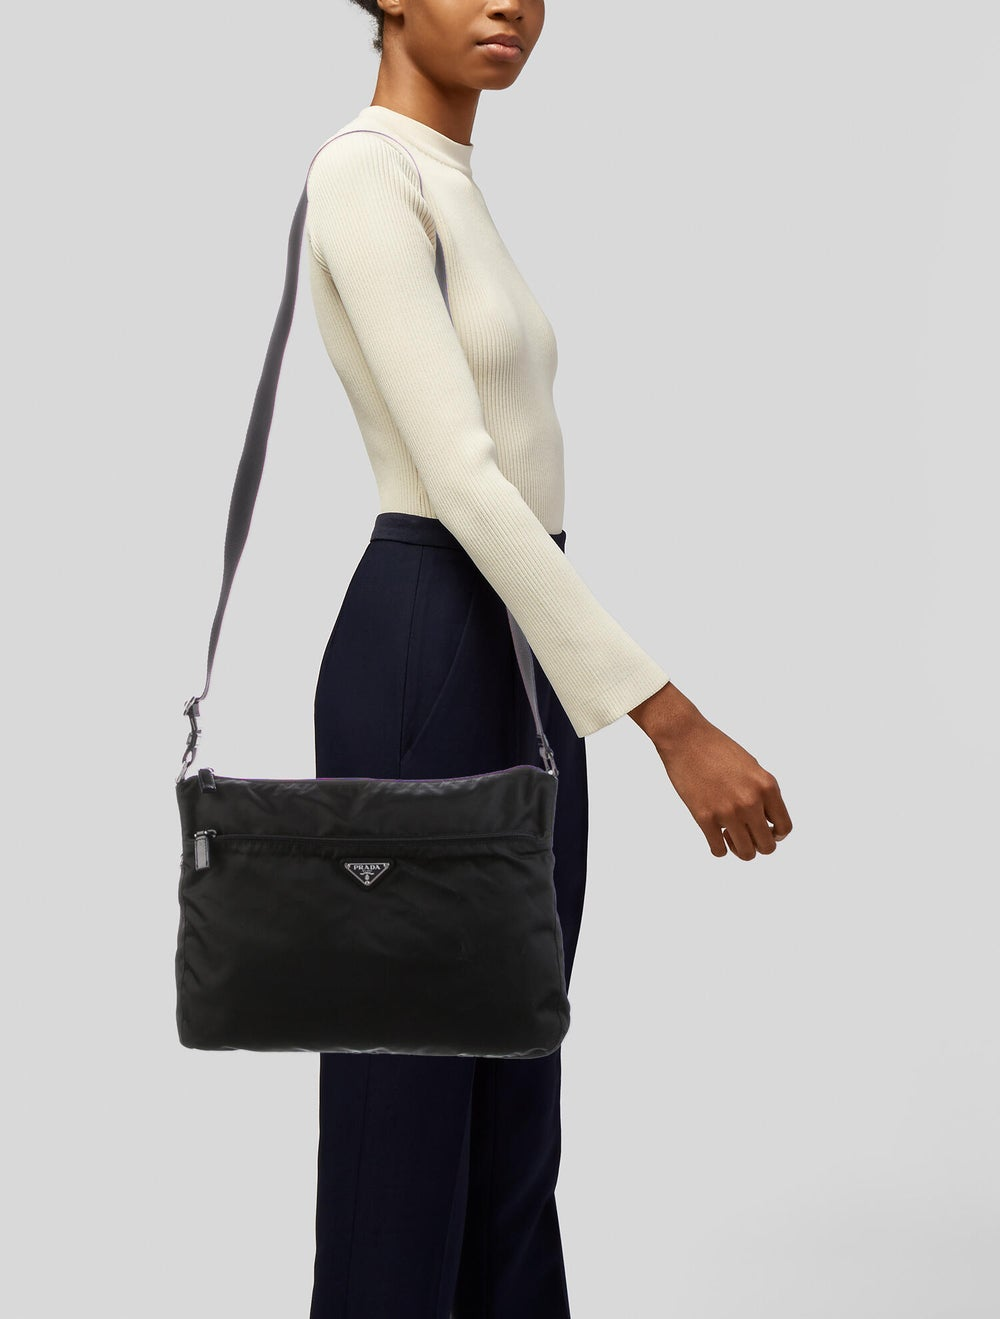 Prada Tessuto Messenger Bag Black - image 2